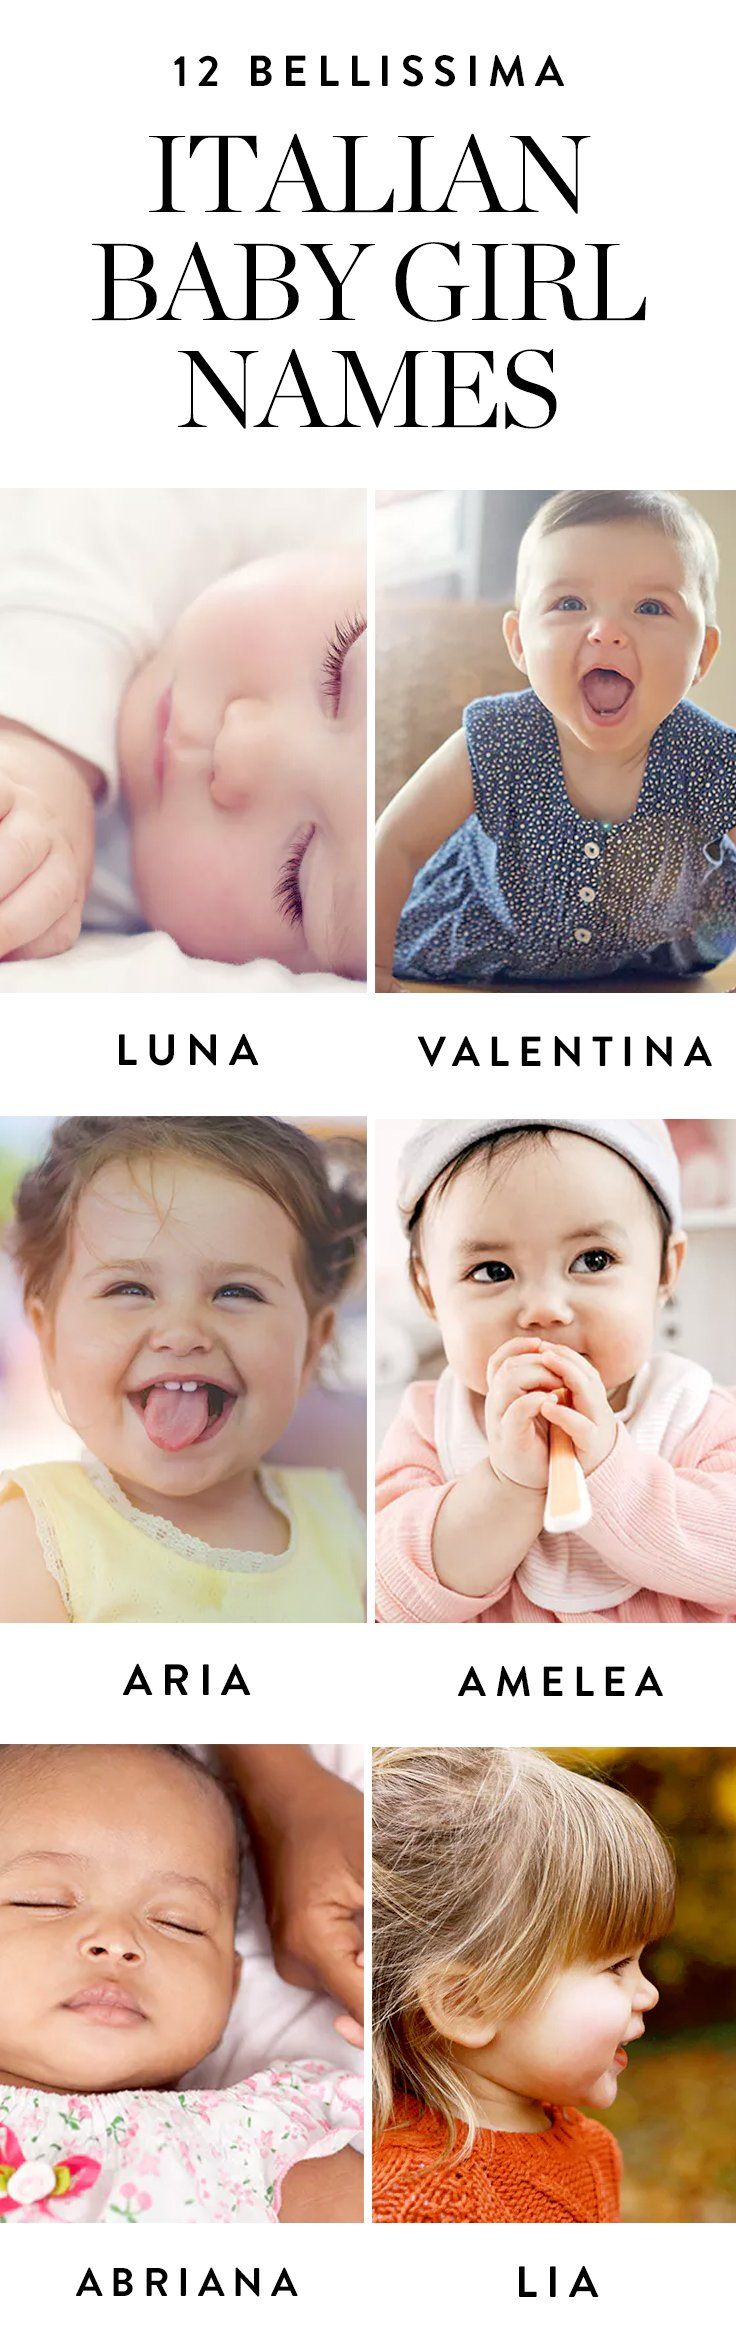 Here are 12 bellissima Italian baby names for little girls.